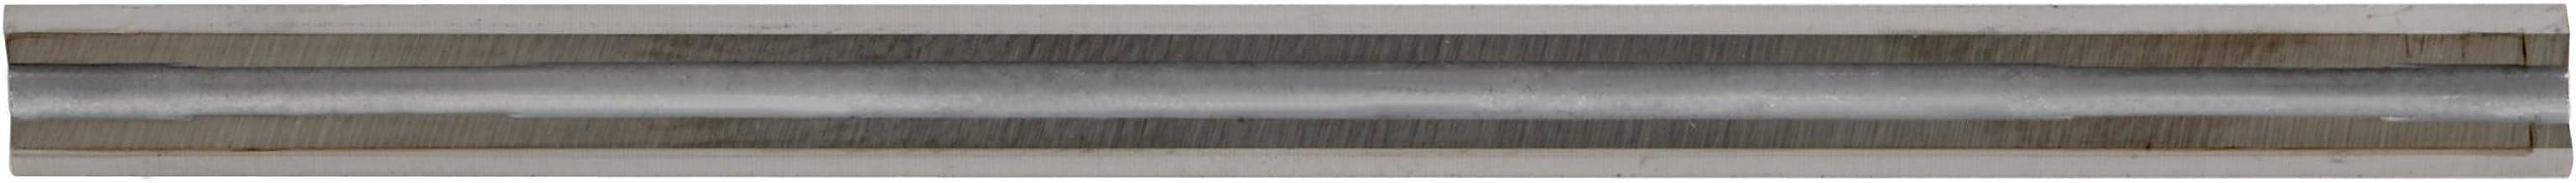 Bosch 2609256649 Planner Knive HM//CT